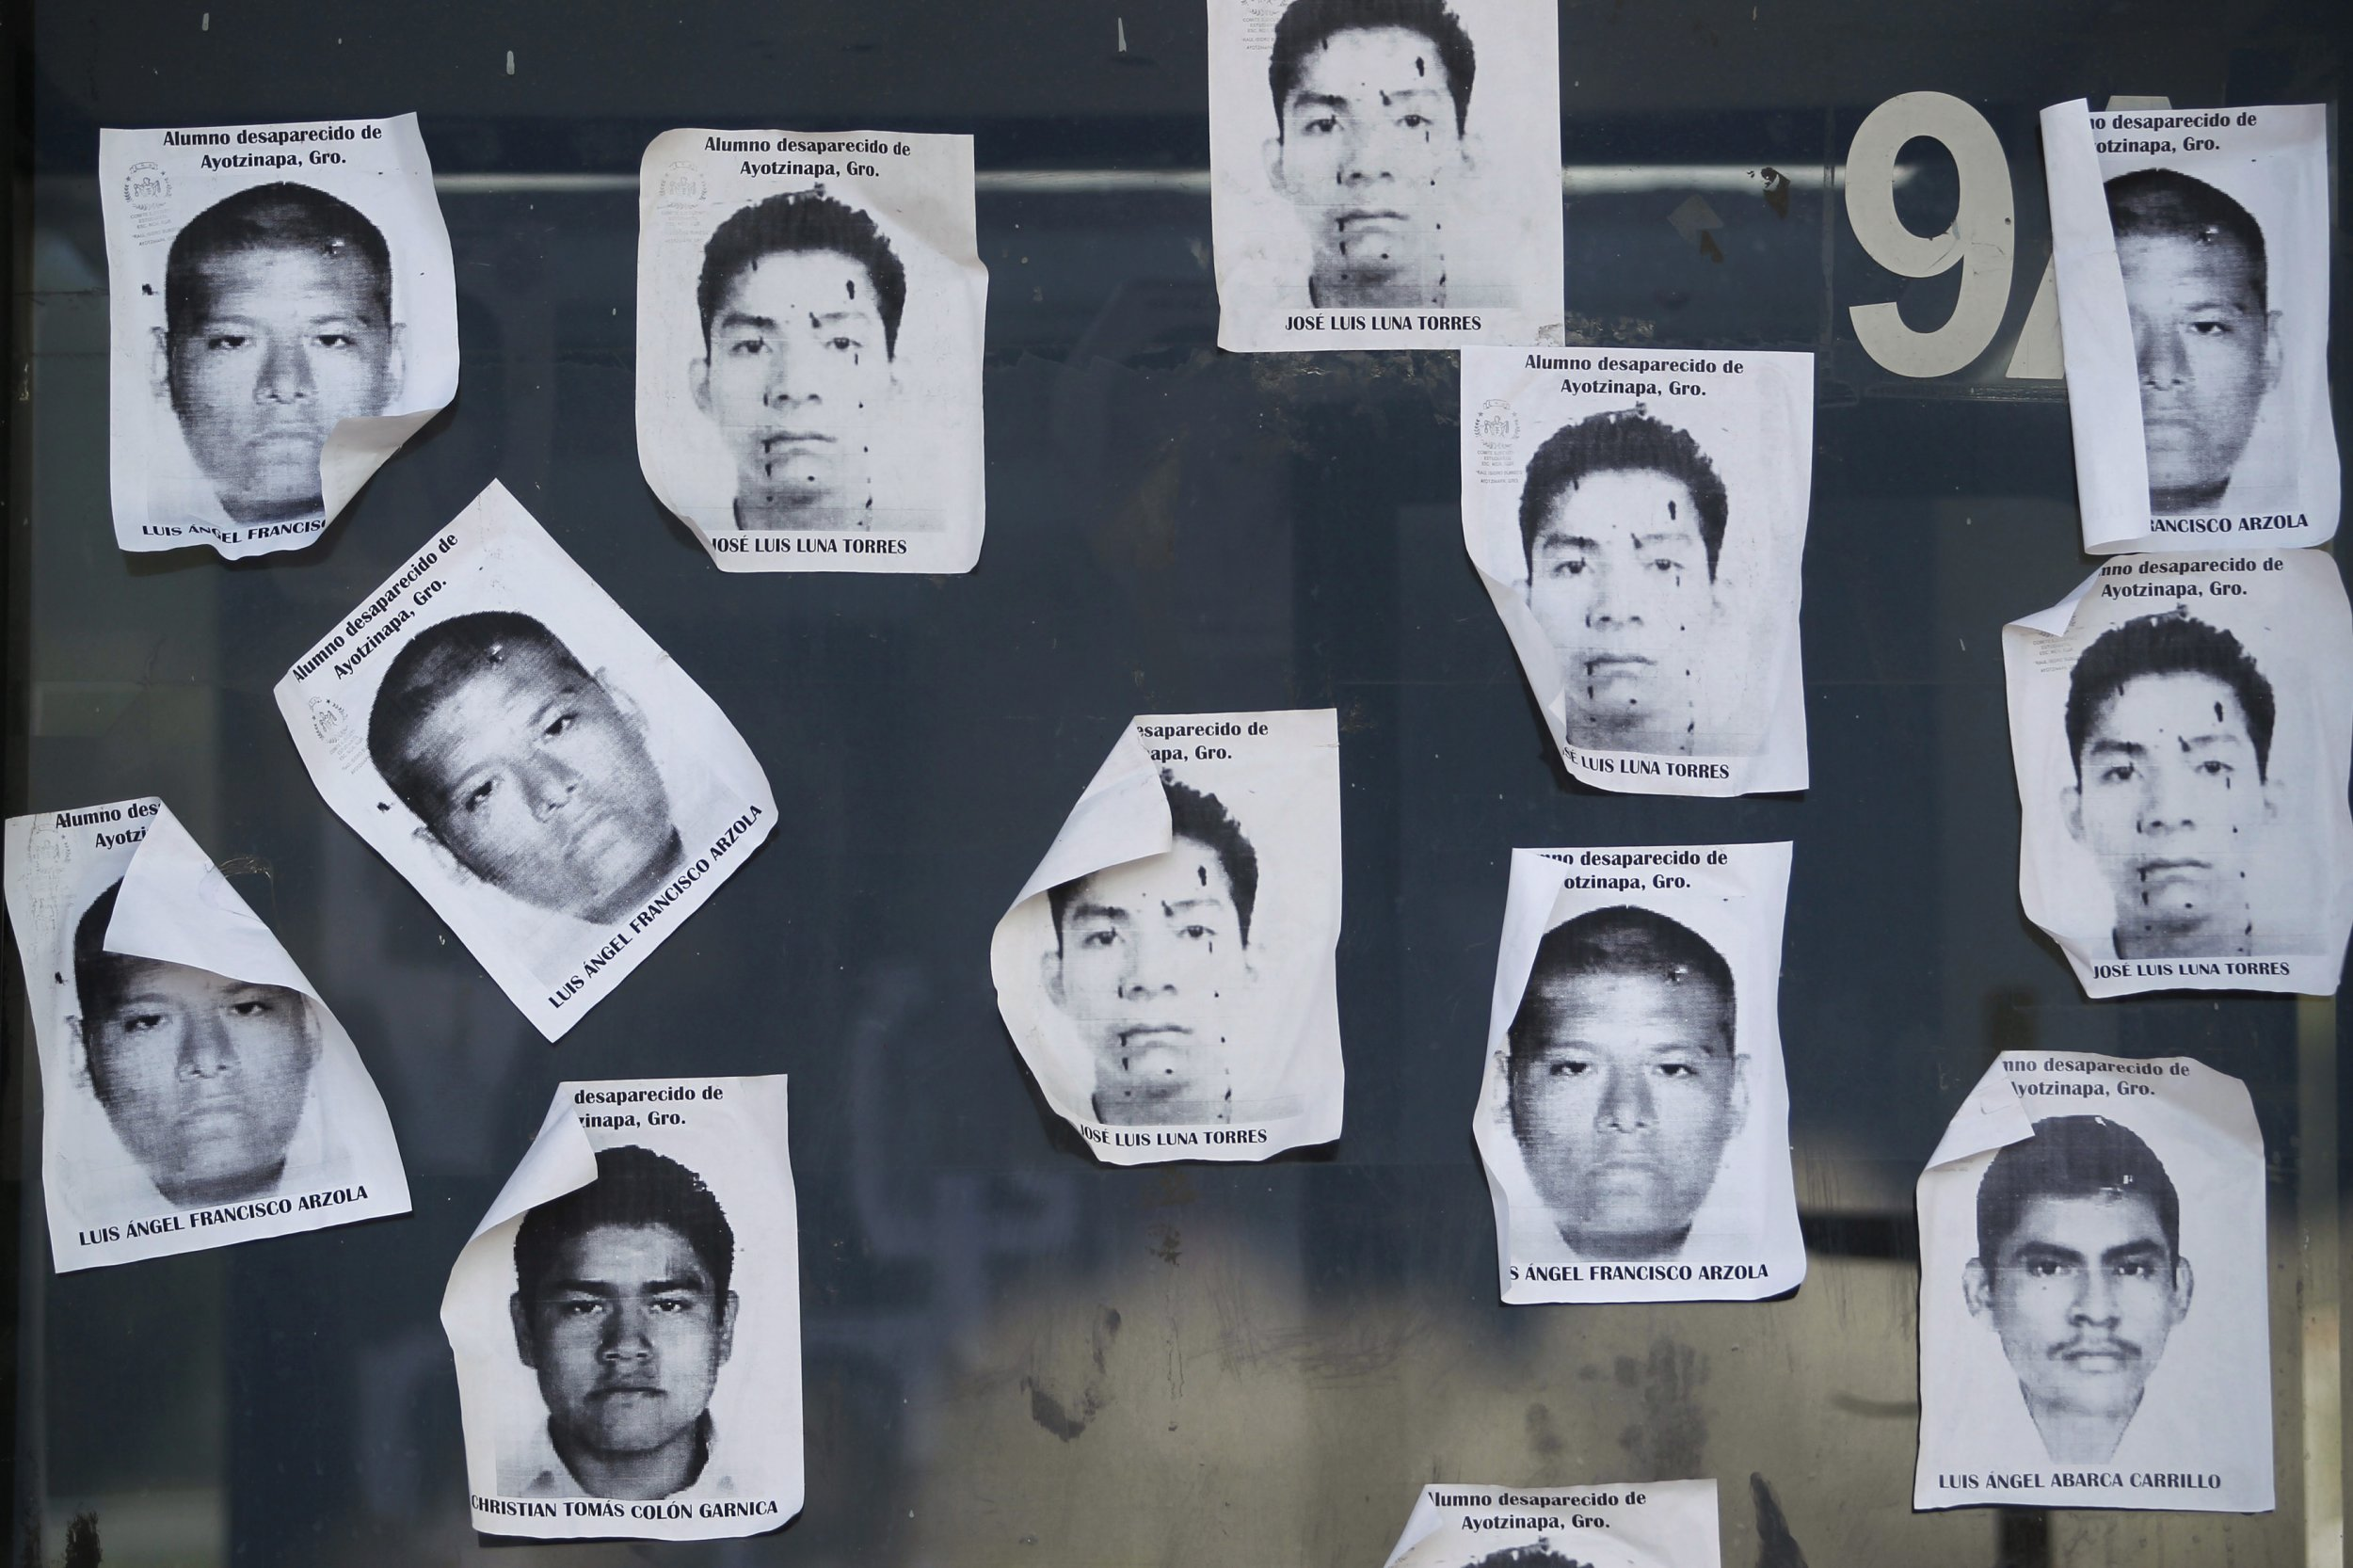 mexico drug war life expectancy_0106